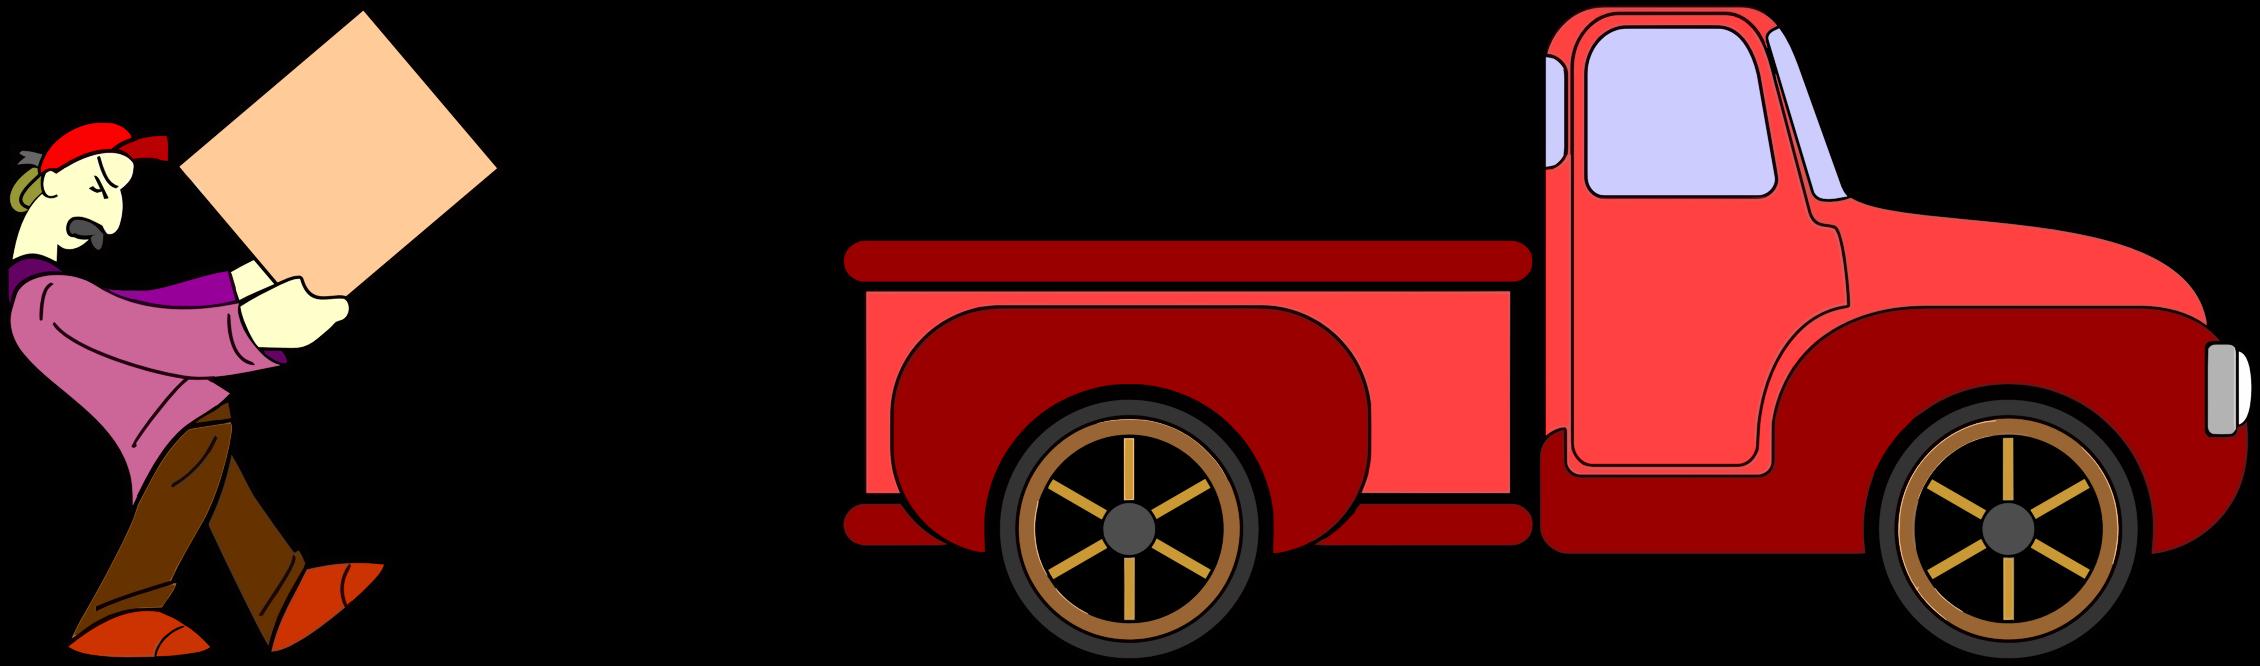 2260x666 Truck Clipart Red Truck